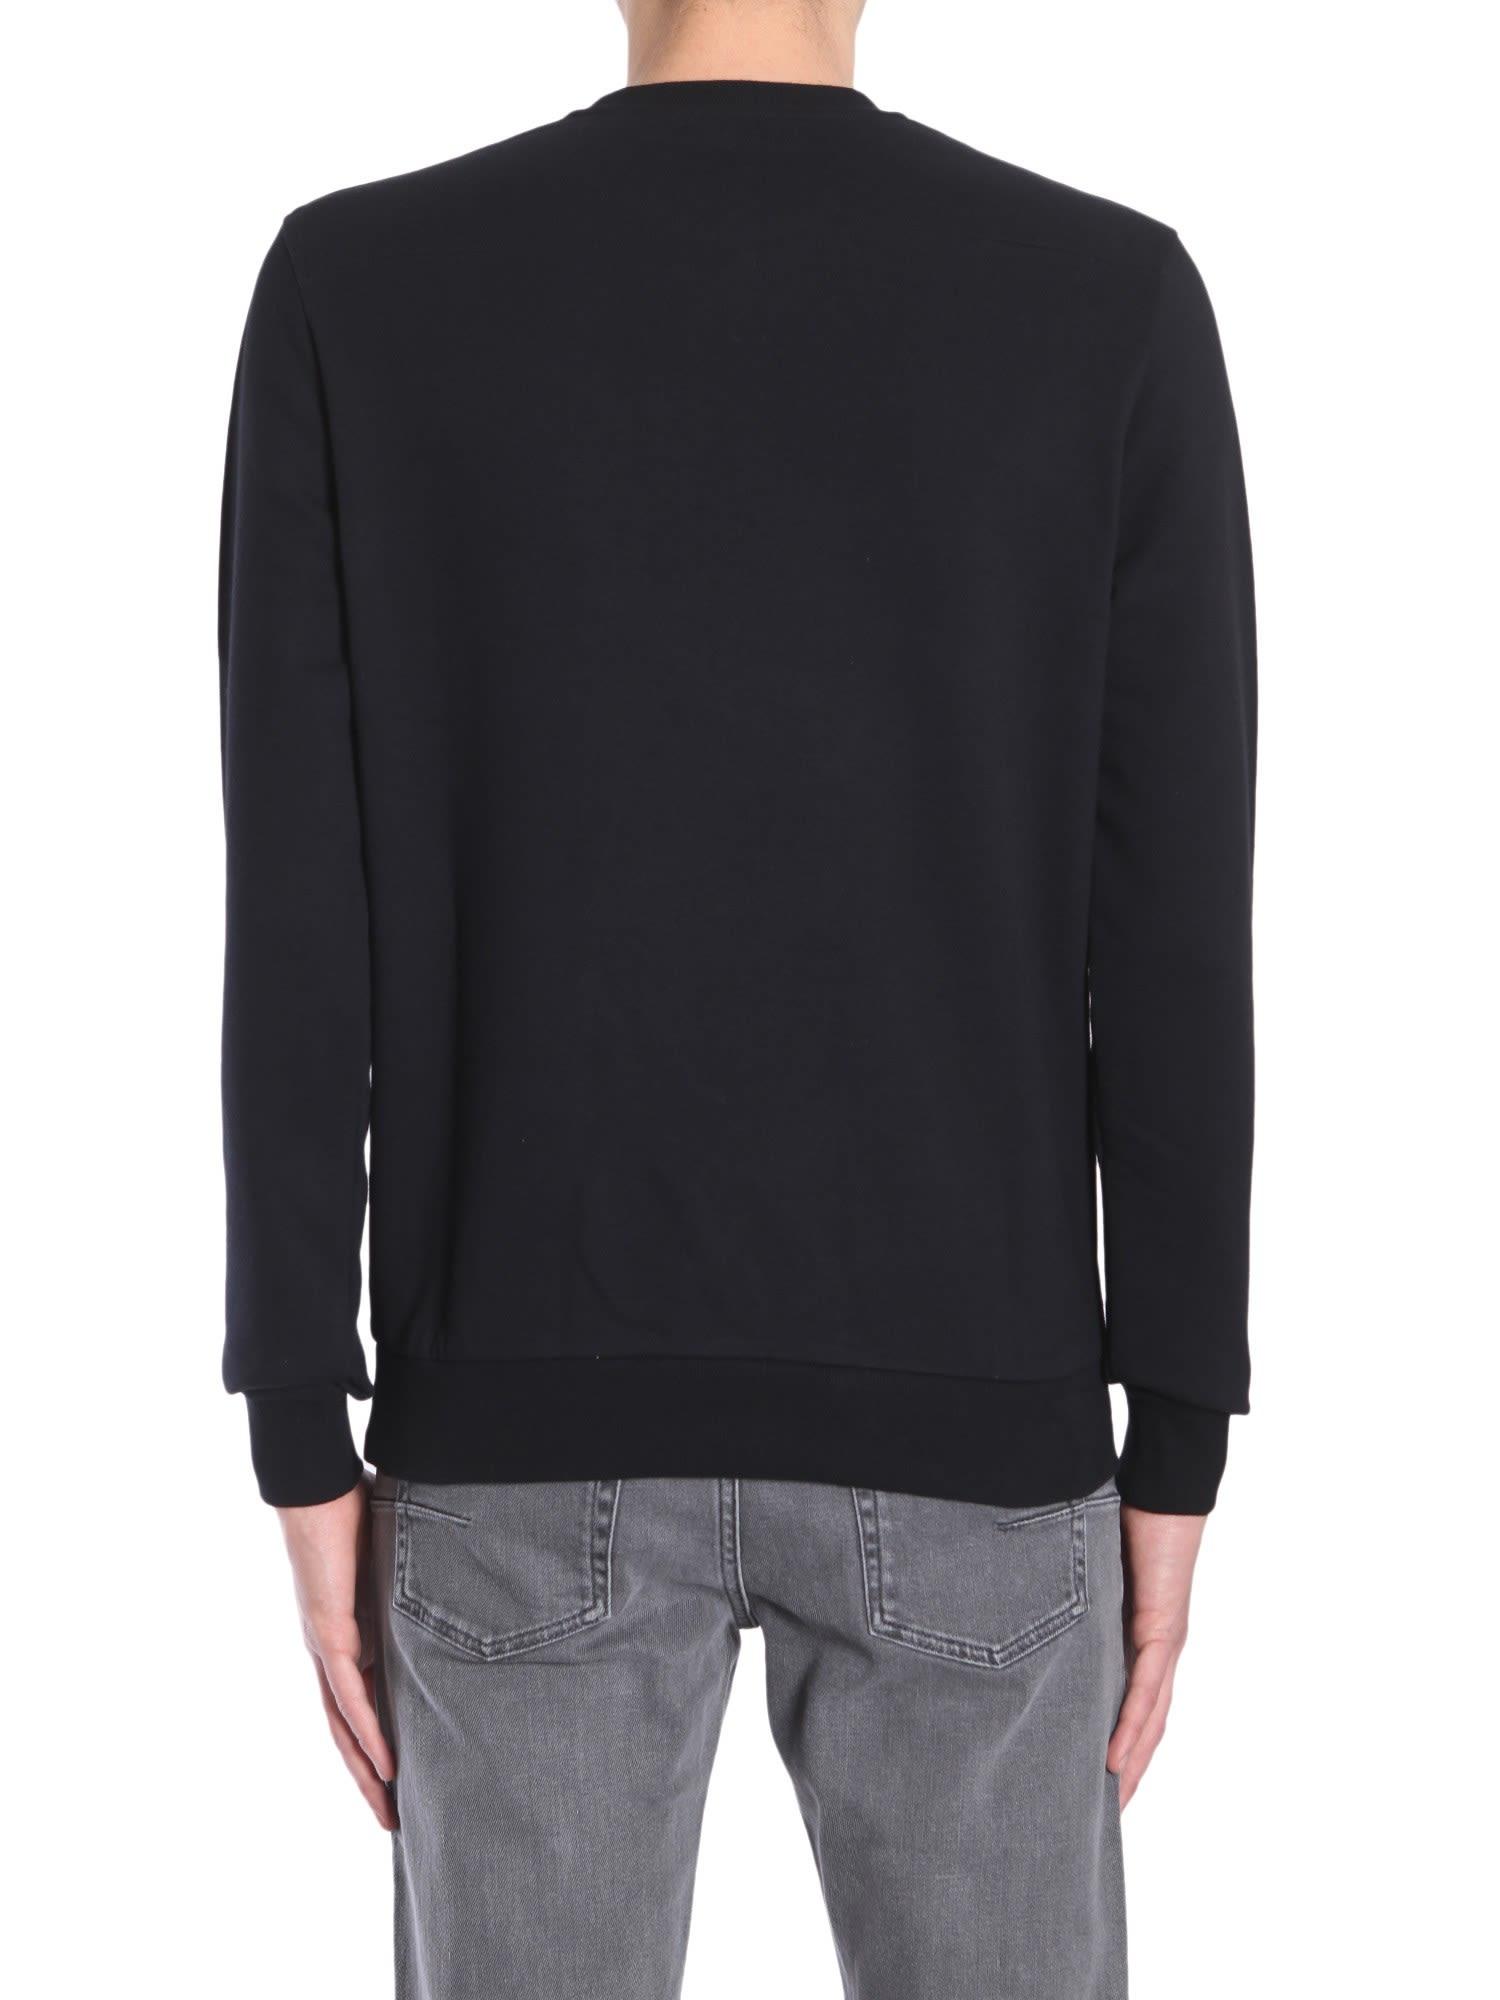 092d2c9d48111 Dior Homme Dior Homme Sweatshirt With